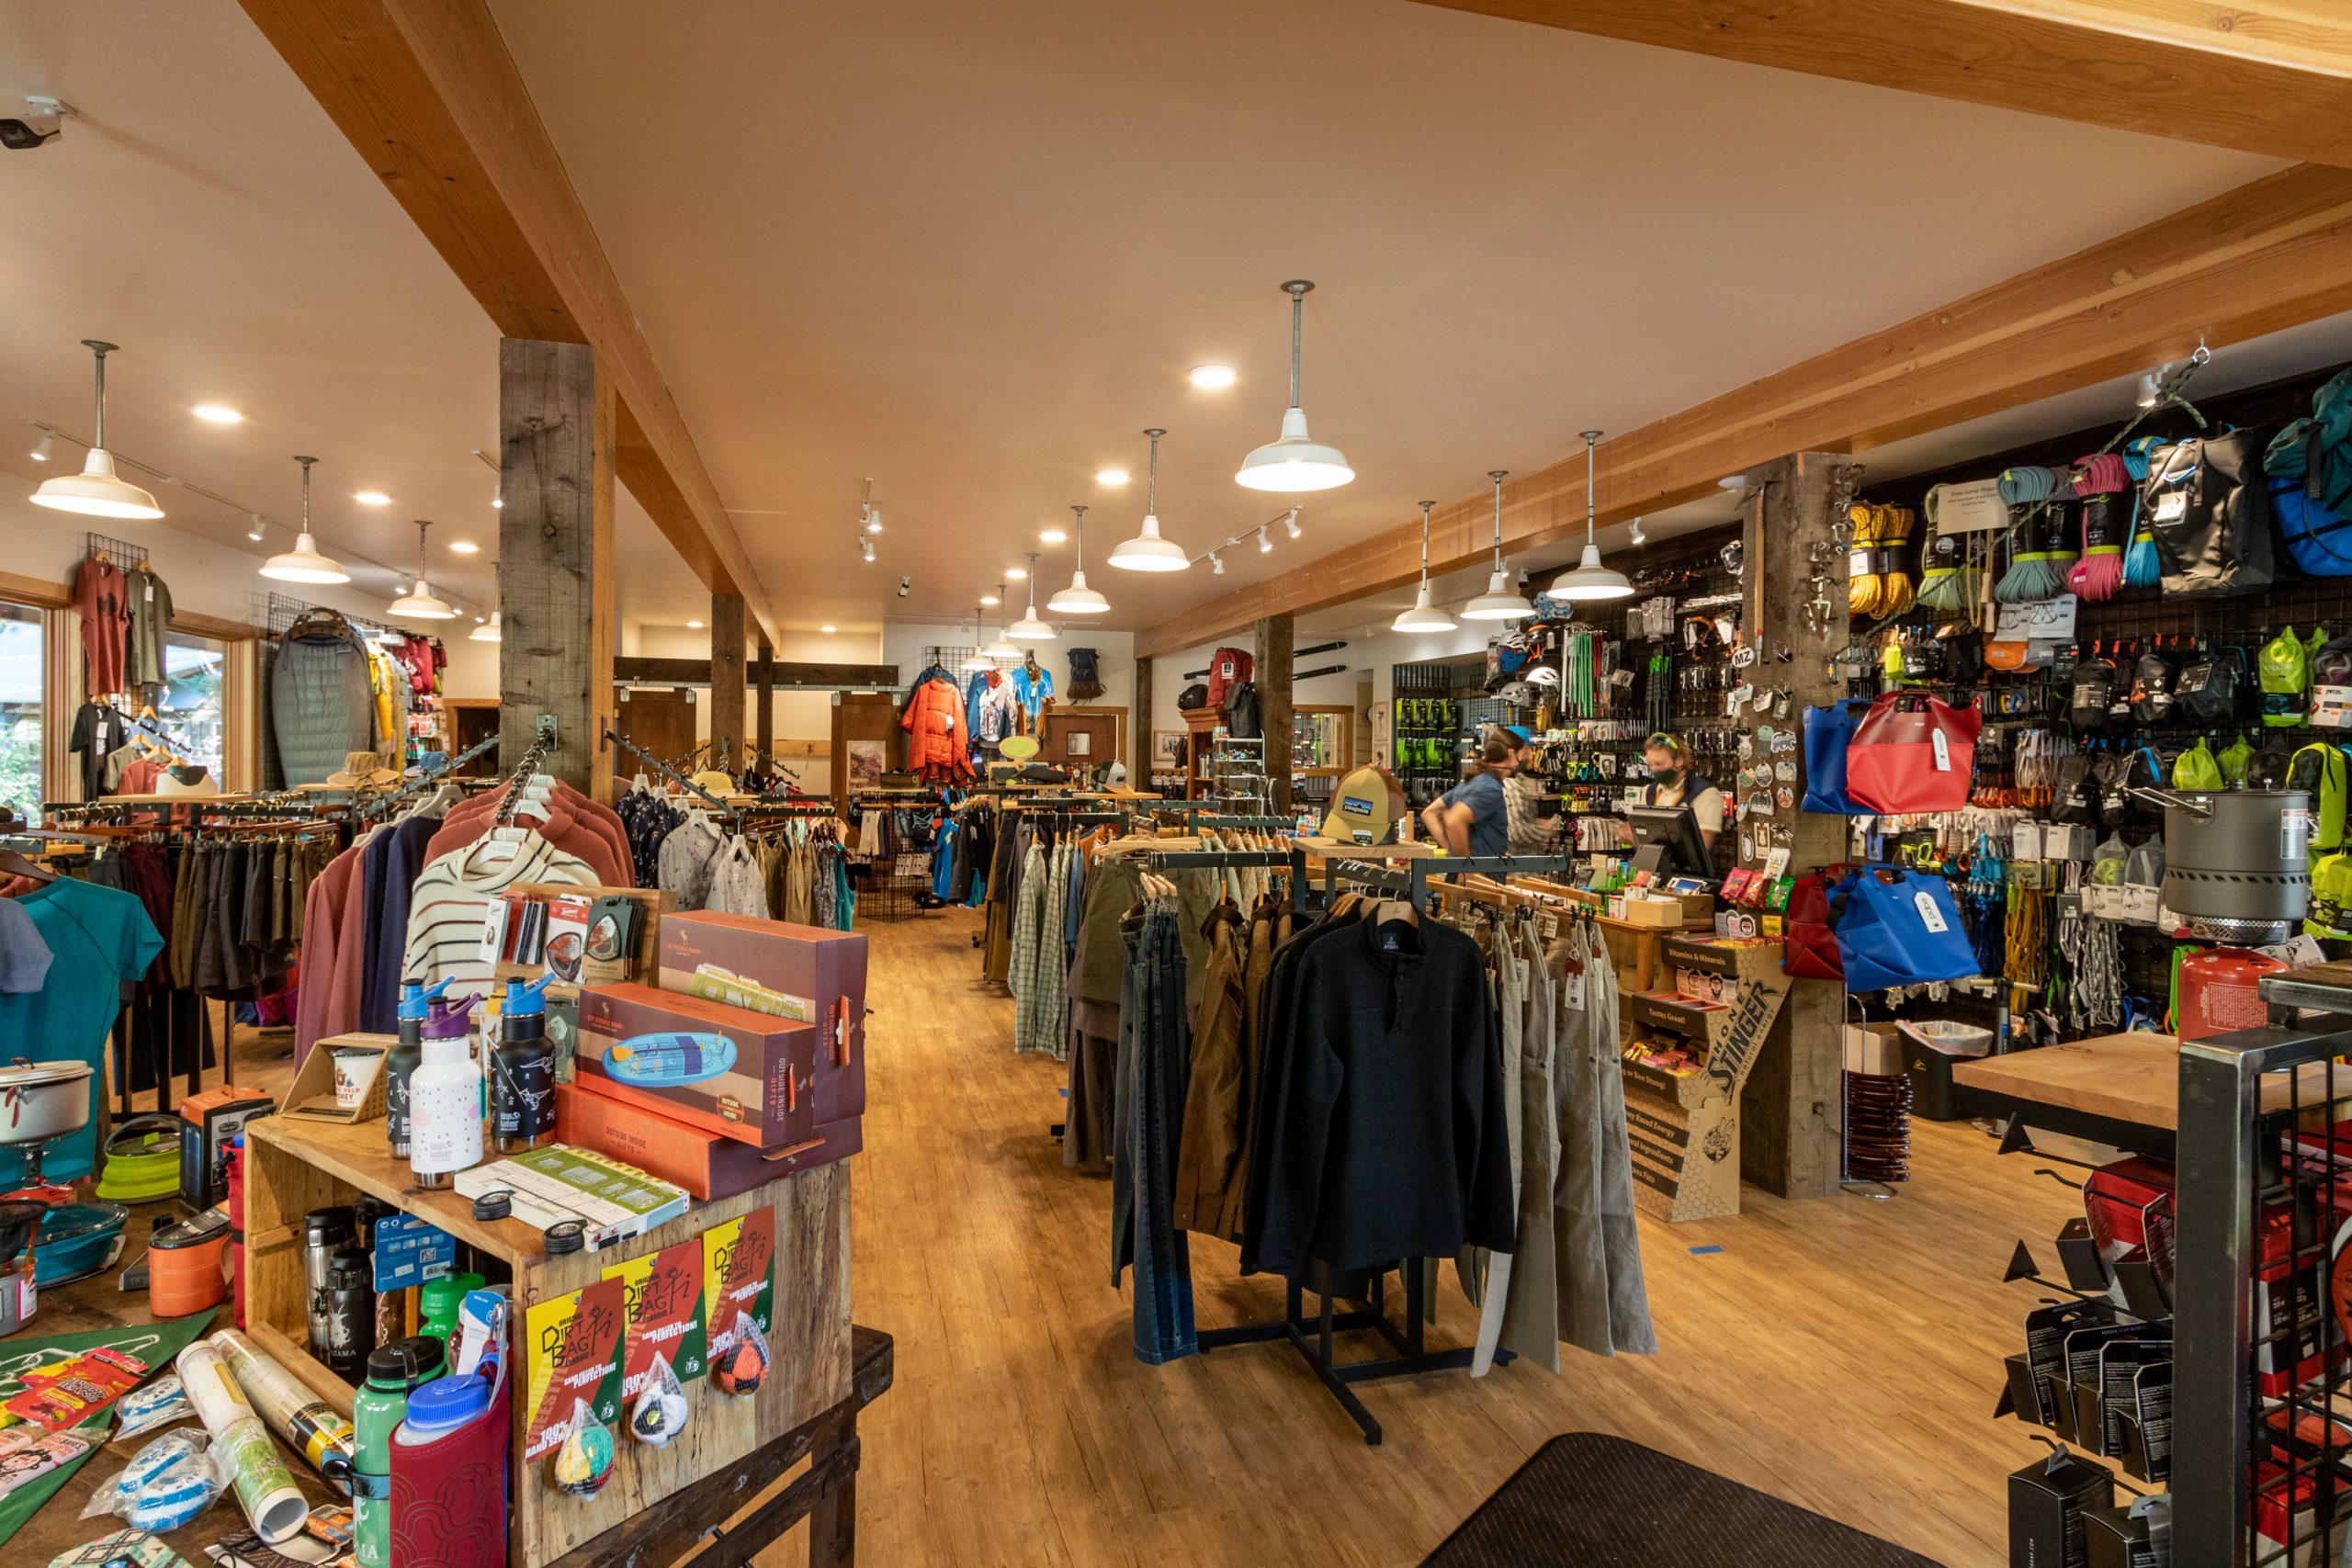 Inside the Goat's Beard Mountain Supplies shop